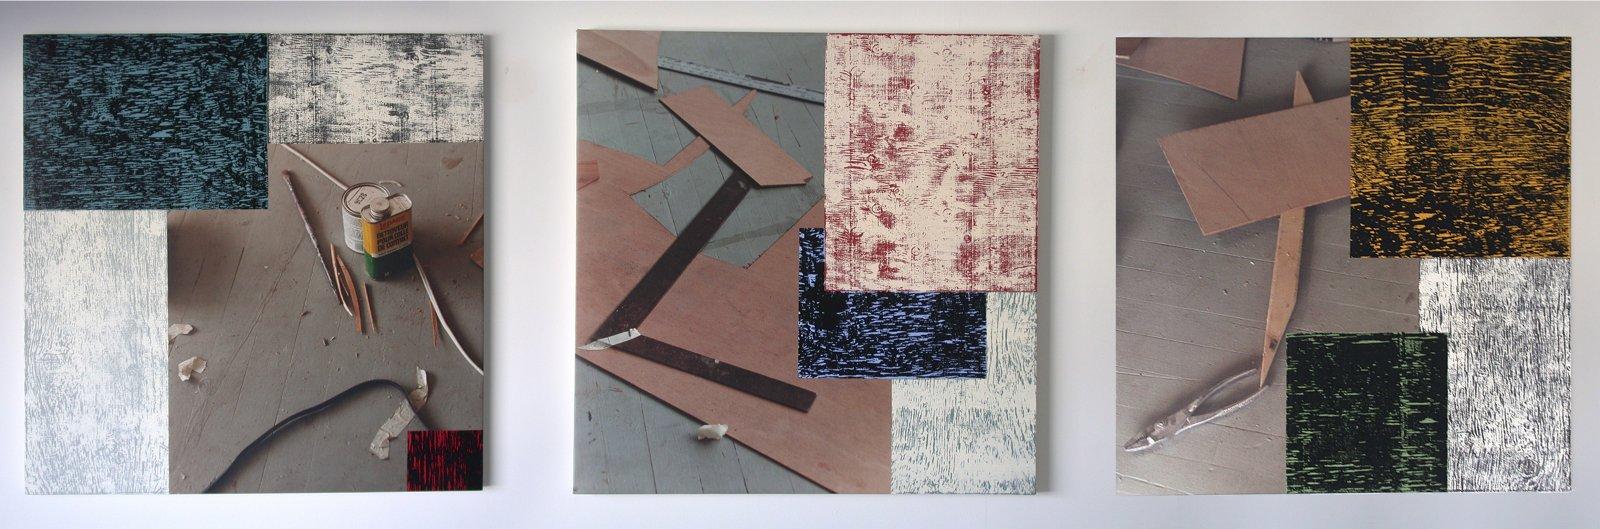 Ian Wallace,The Studio Floor I–III, 1996,3 acrylic, photolaminate and ink monoprint on canvas panels, 36 x 36 in. (91 x 91 cm)